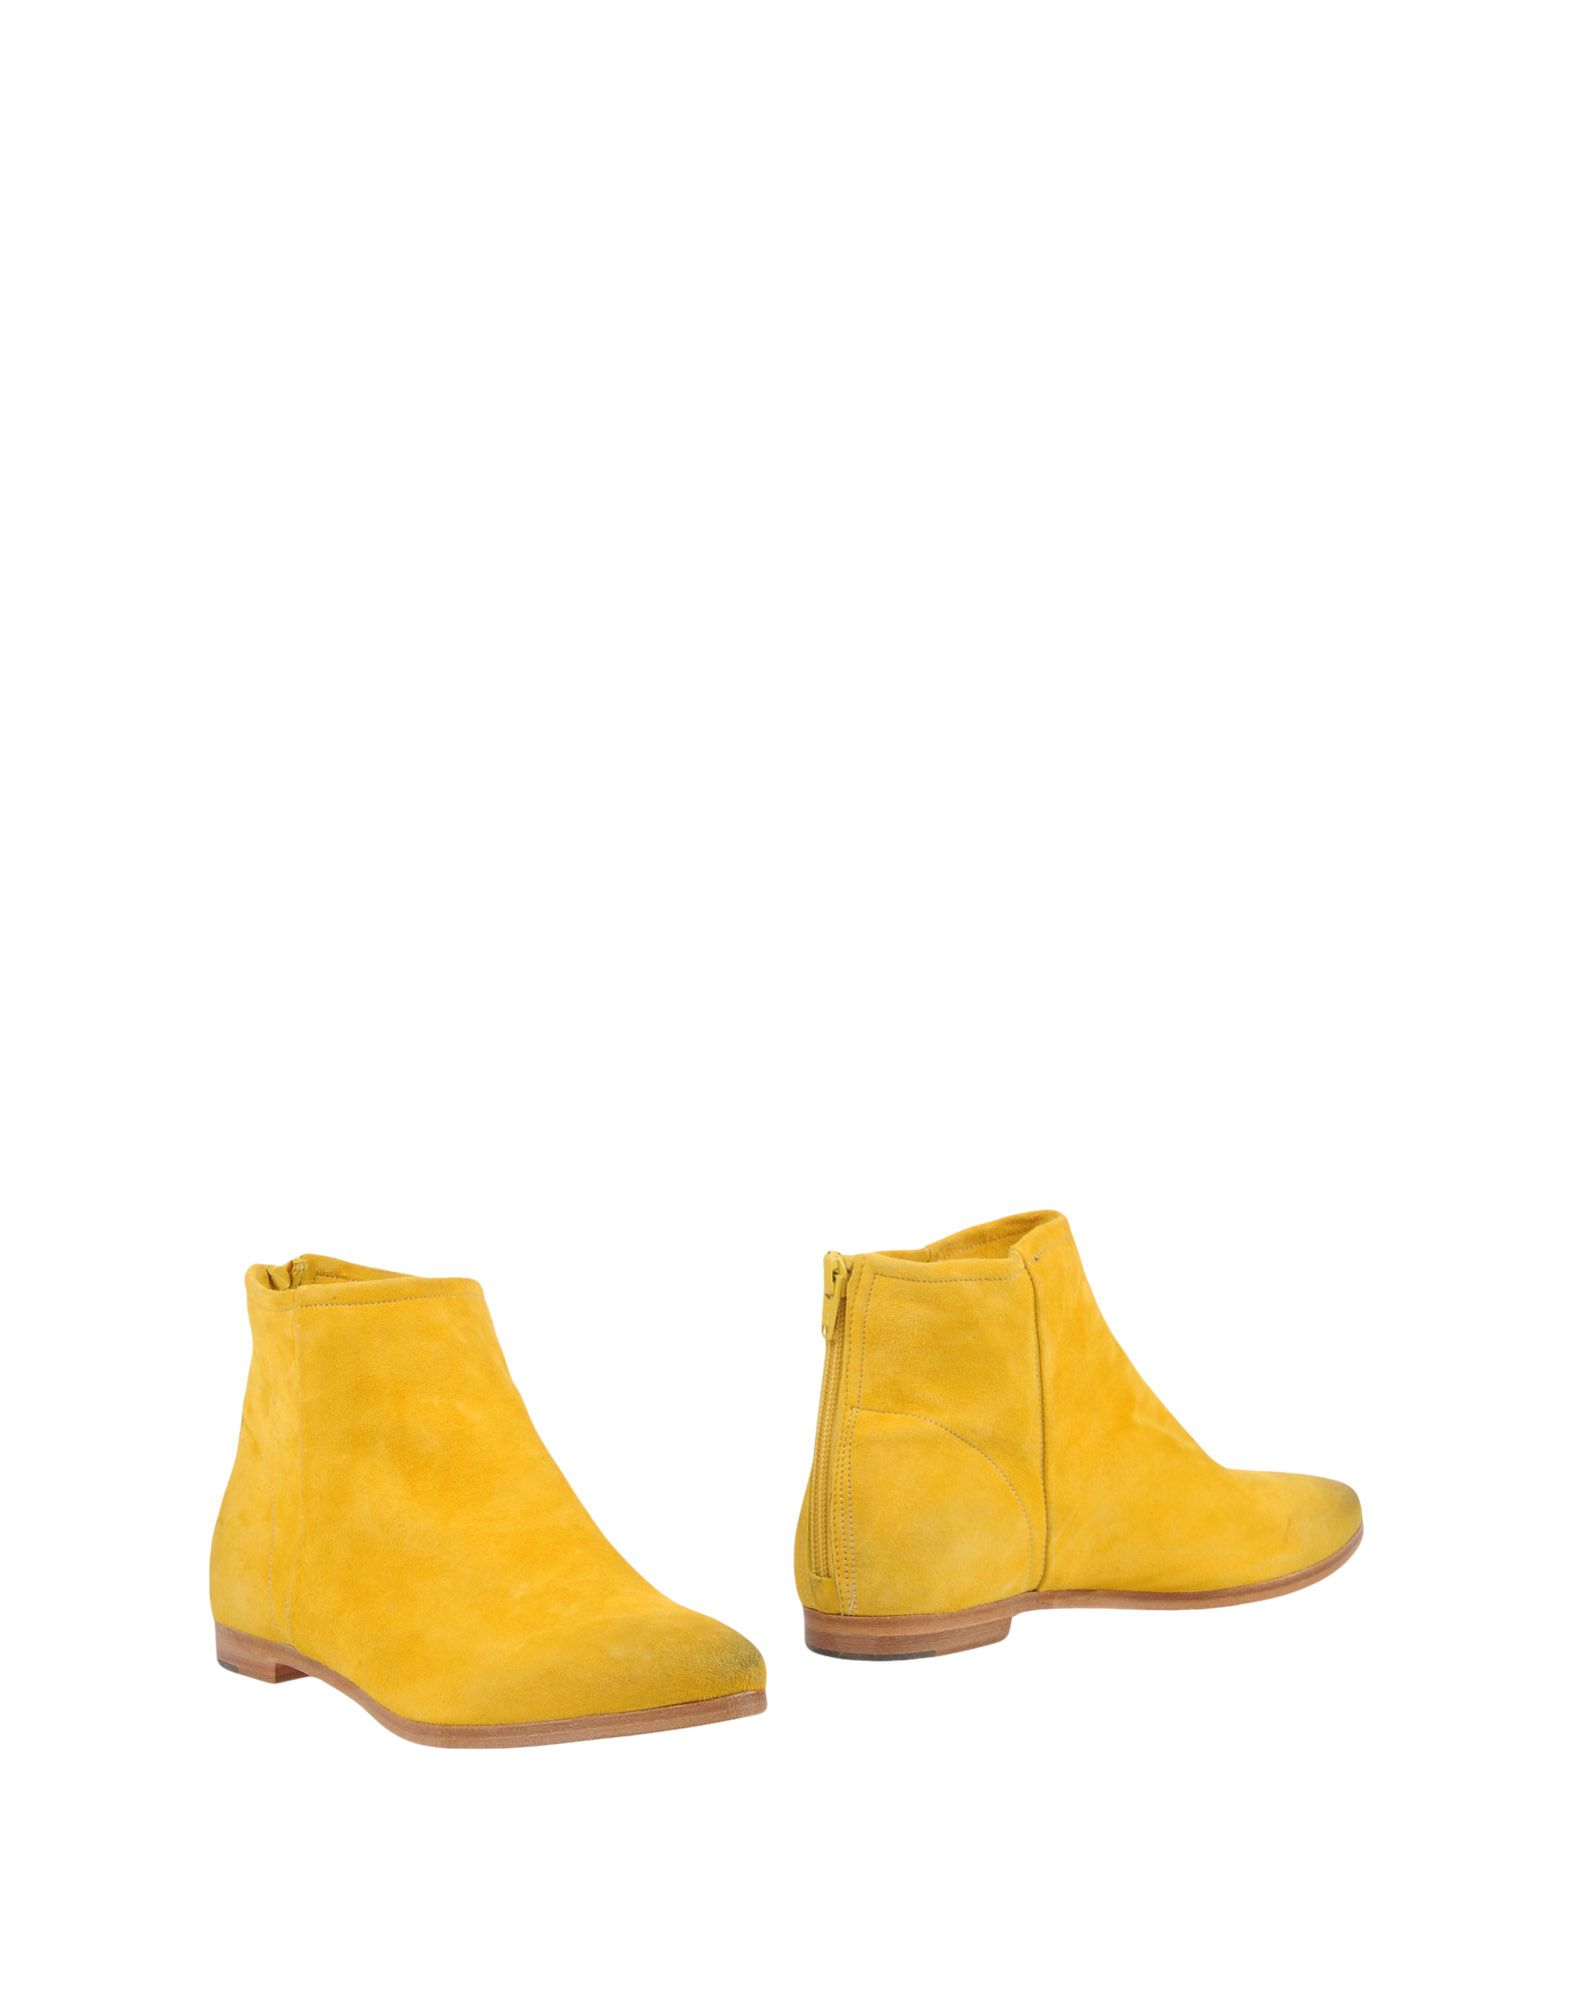 SMITH'S AMERICAN Полусапоги и высокие ботинки ботинки american apparel ботинки